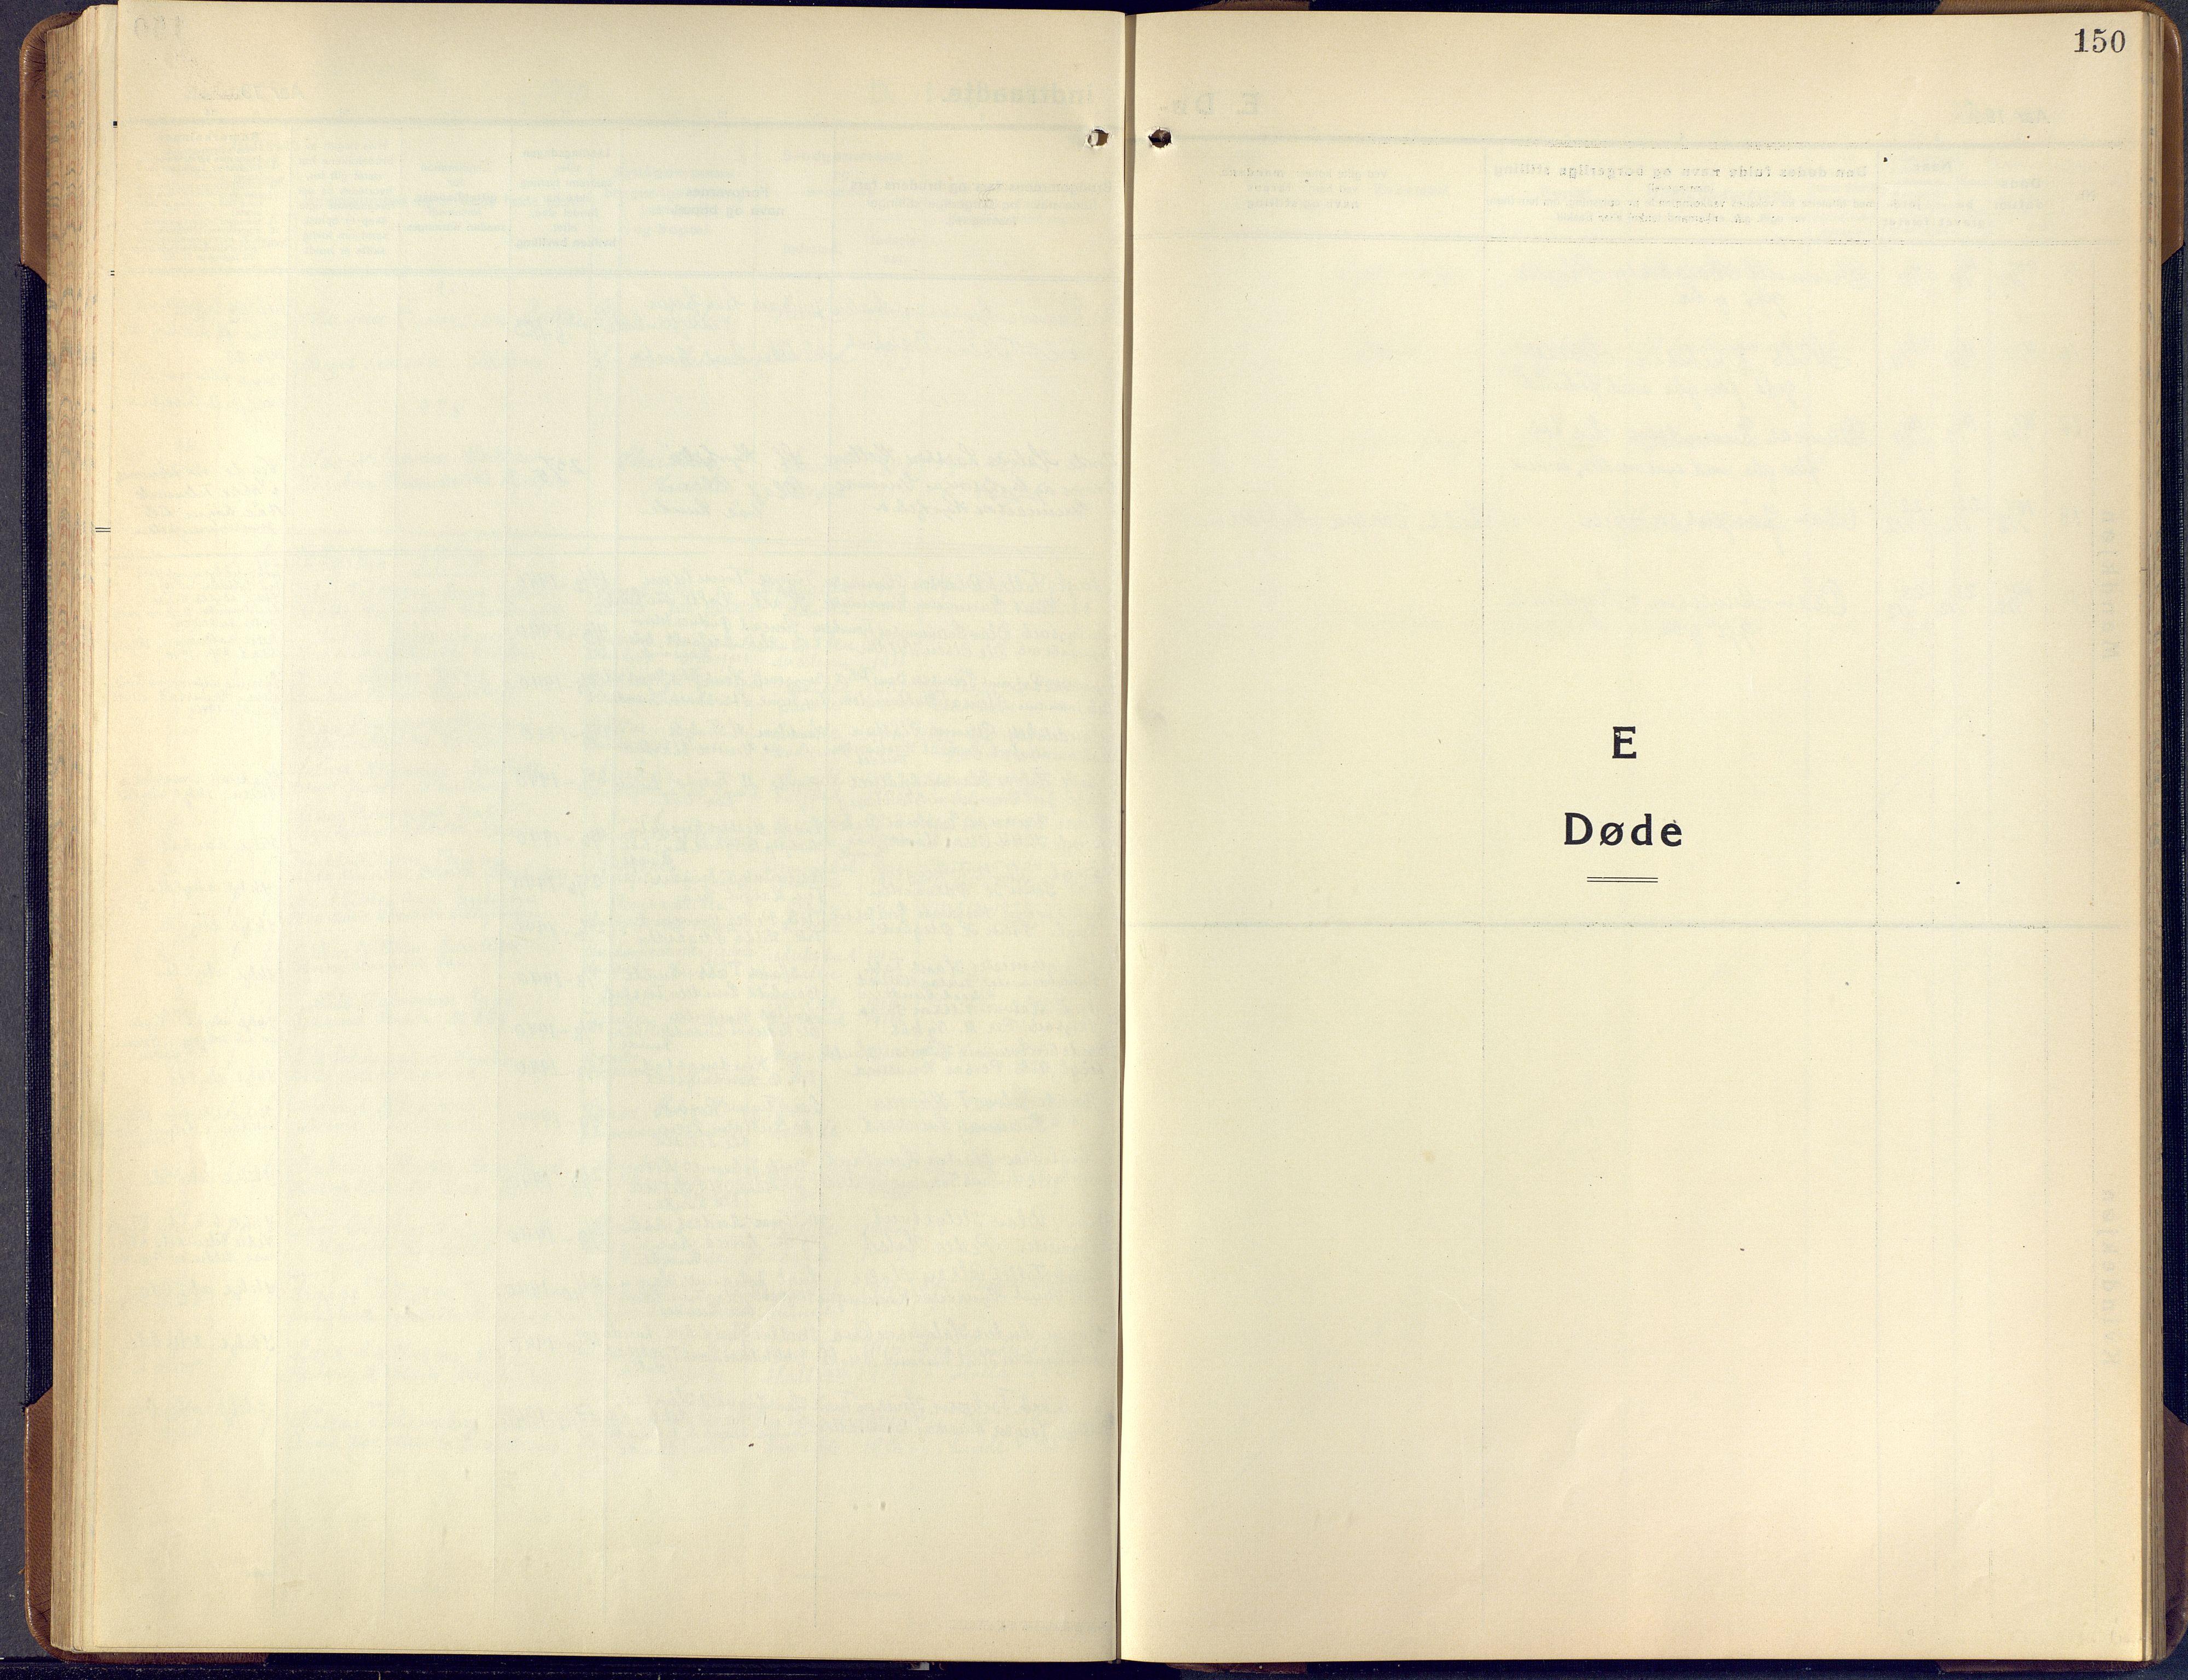 SAKO, Lunde kirkebøker, F/Fa/L0006: Ministerialbok nr. I 6, 1922-1940, s. 150